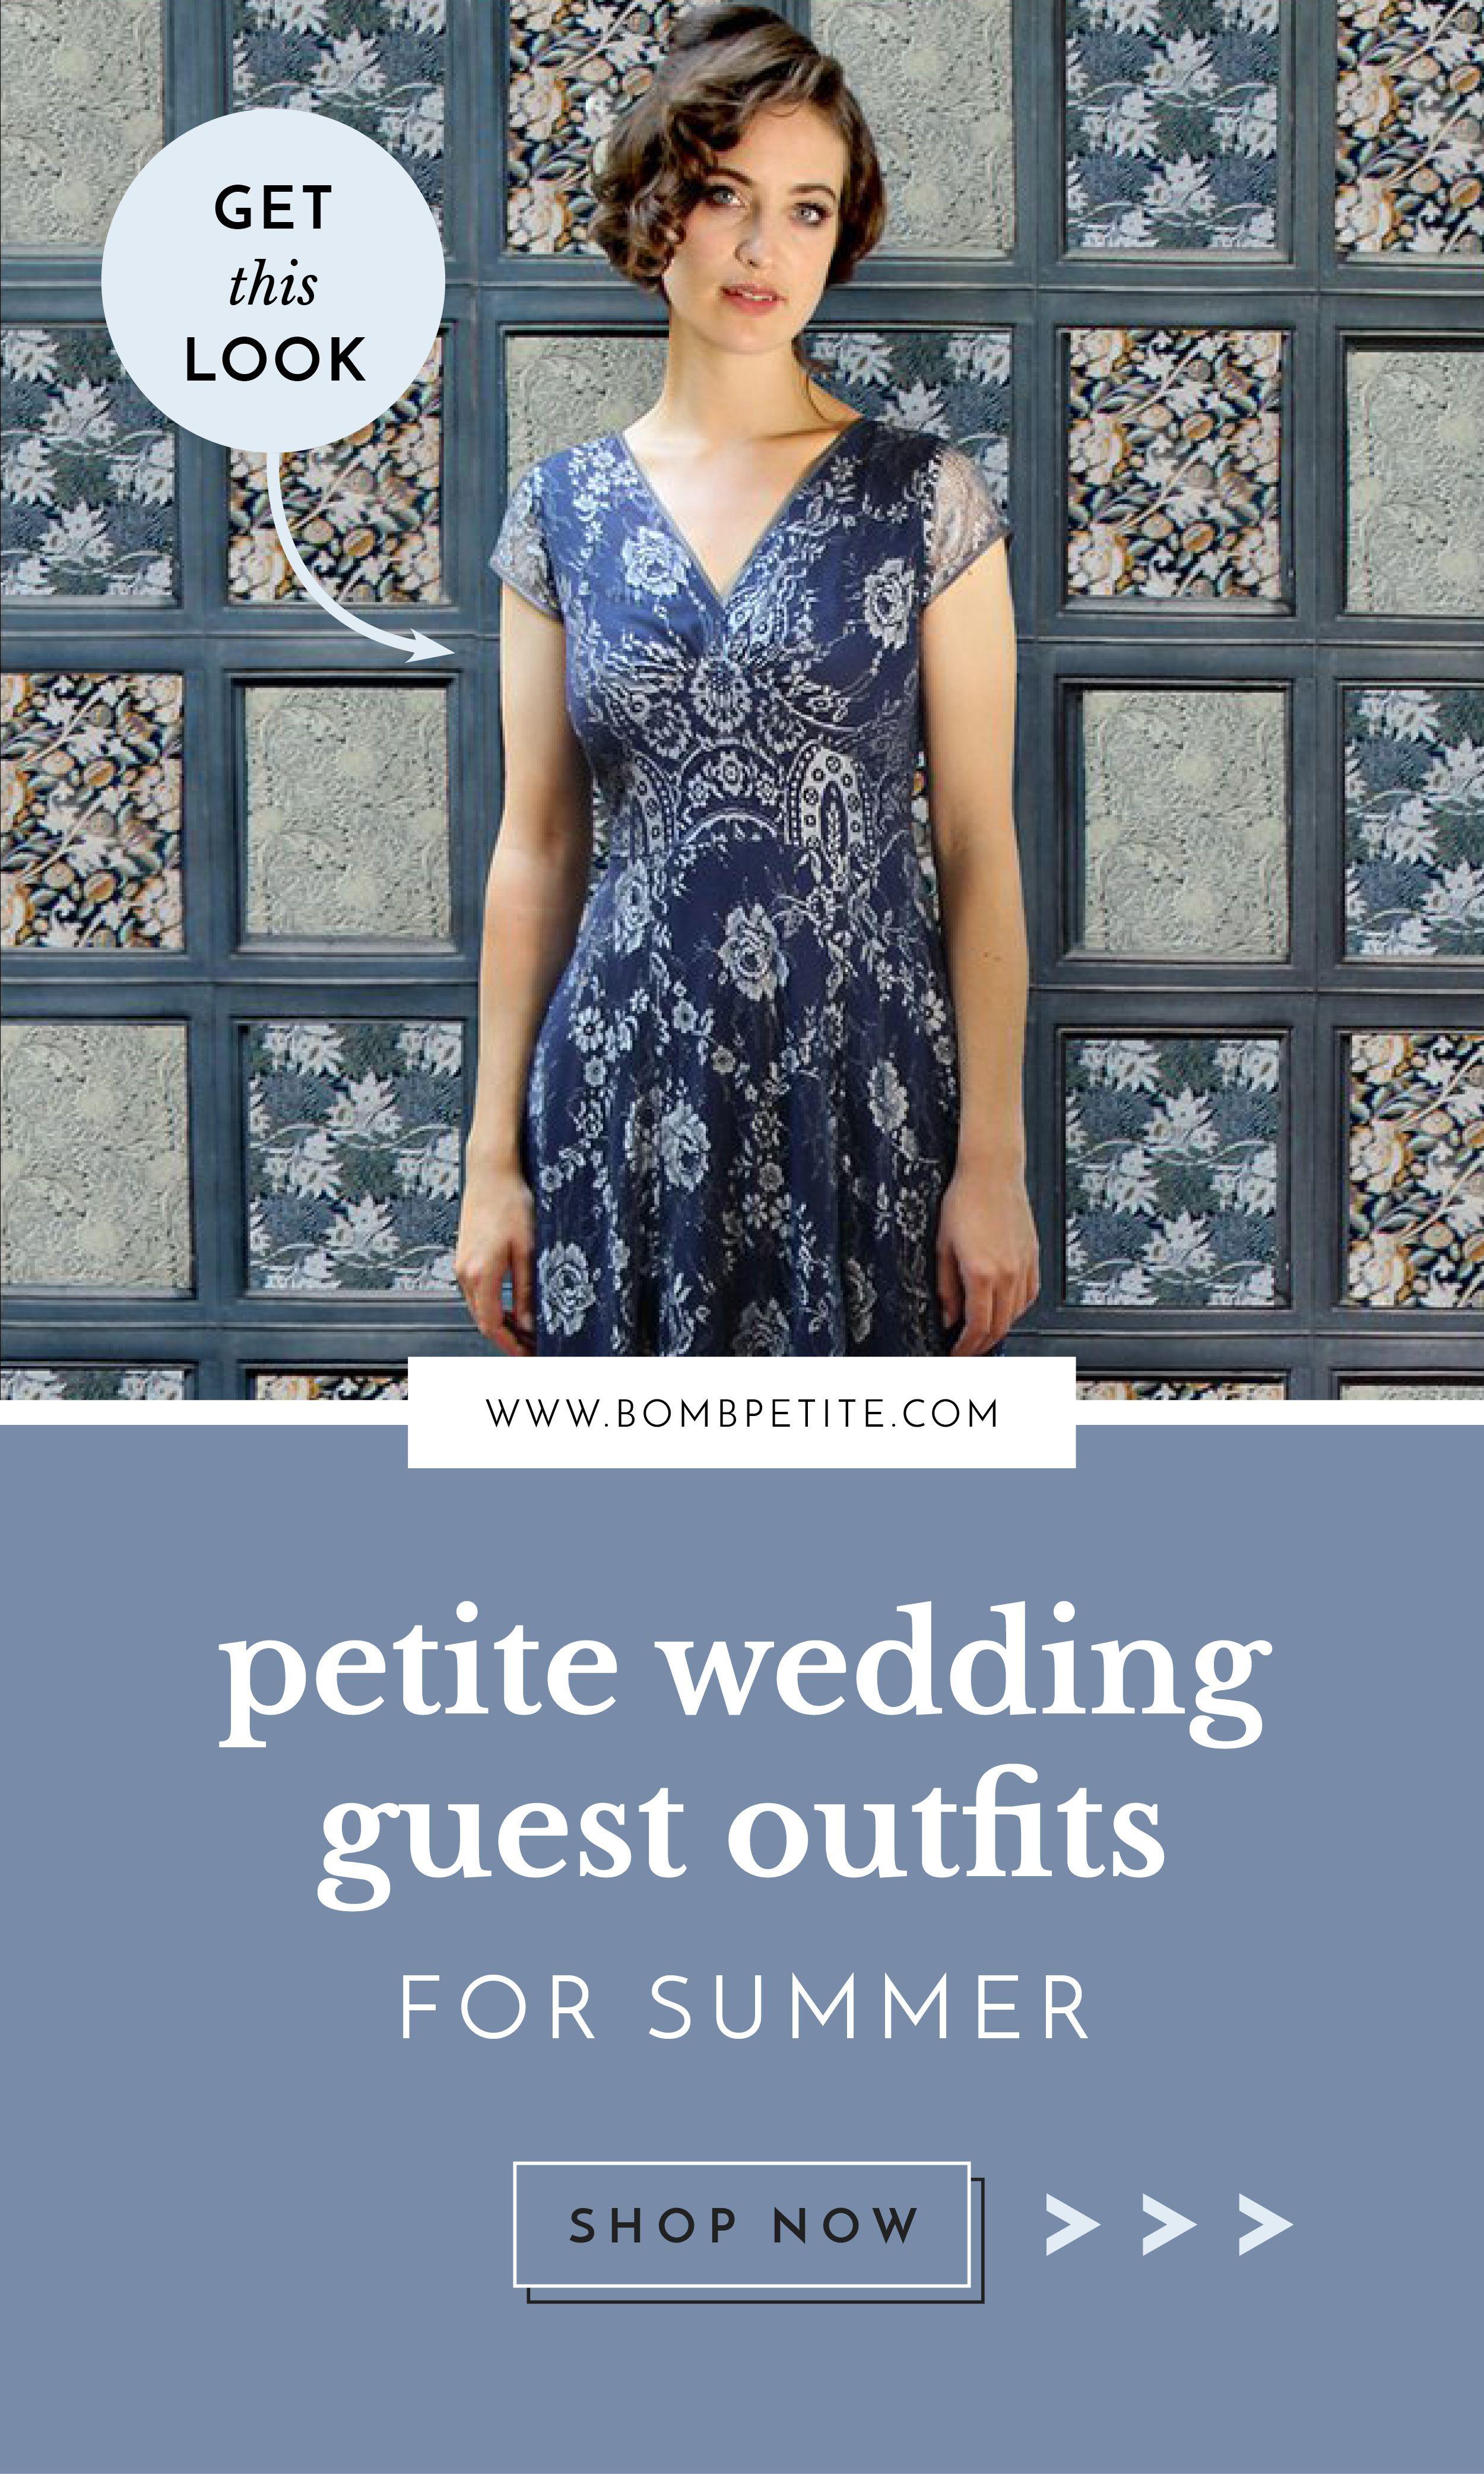 Petite Wedding Guest Dresses Bomb Petite Petite Wedding Guest Dresses Petite Wedding Outfits Petite Wedding Guest Outfits [ 4167 x 2500 Pixel ]